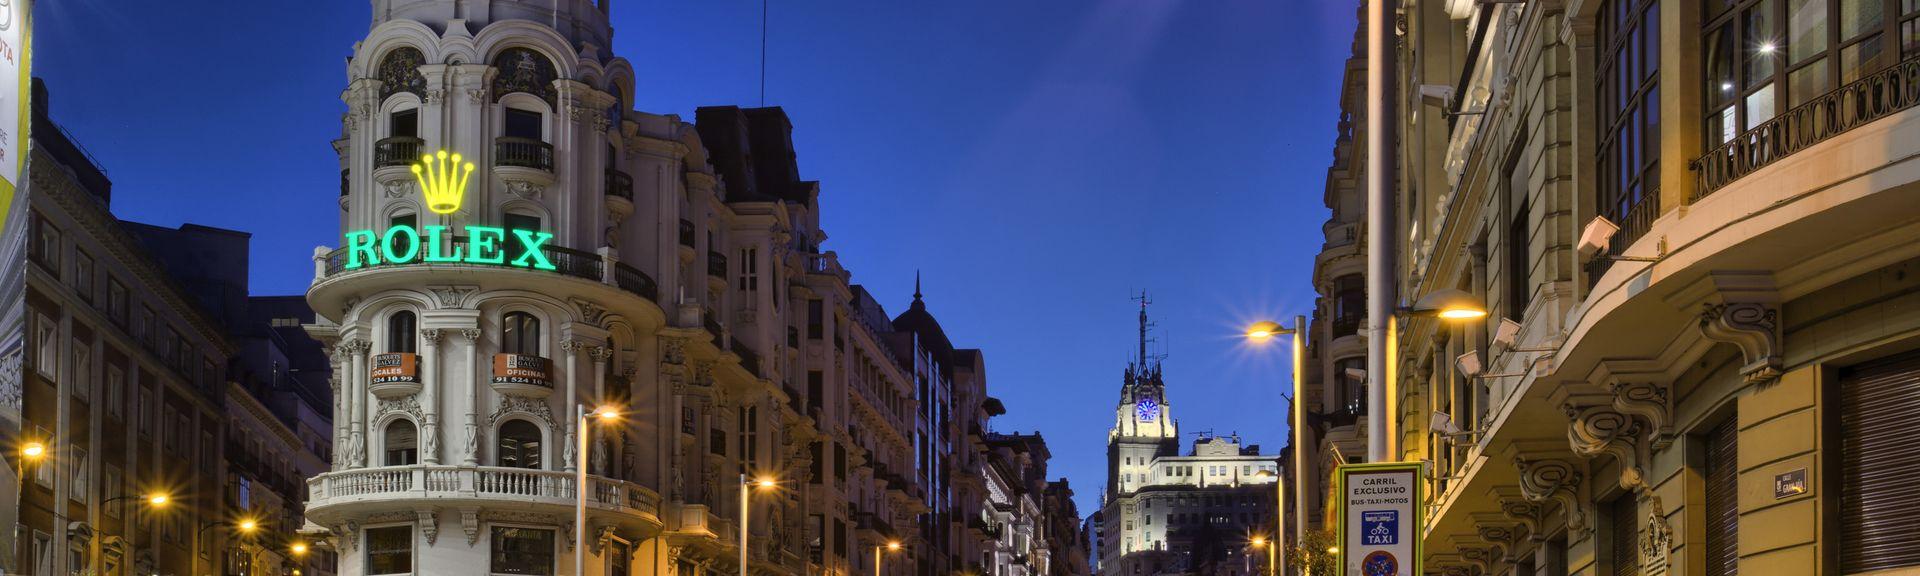 Sol, Madrid, Madrid, Spanien